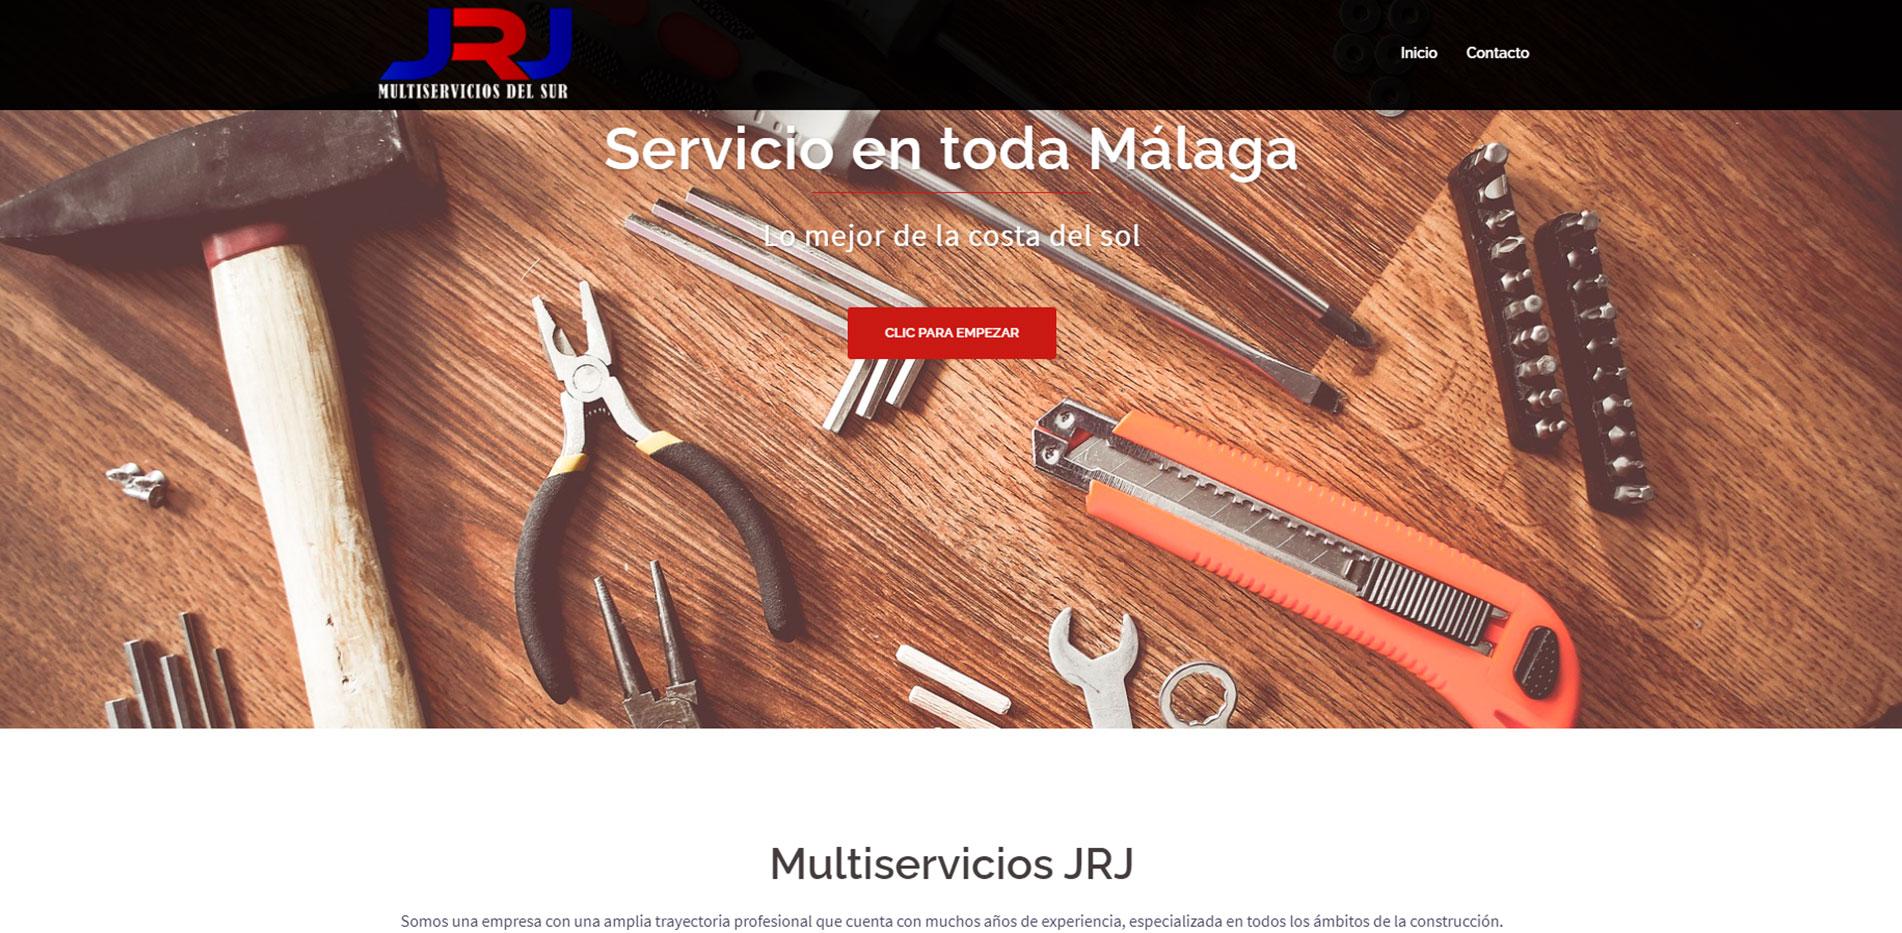 Captura-de-pantalla-MultiserviciosJRJ-1-1902x933